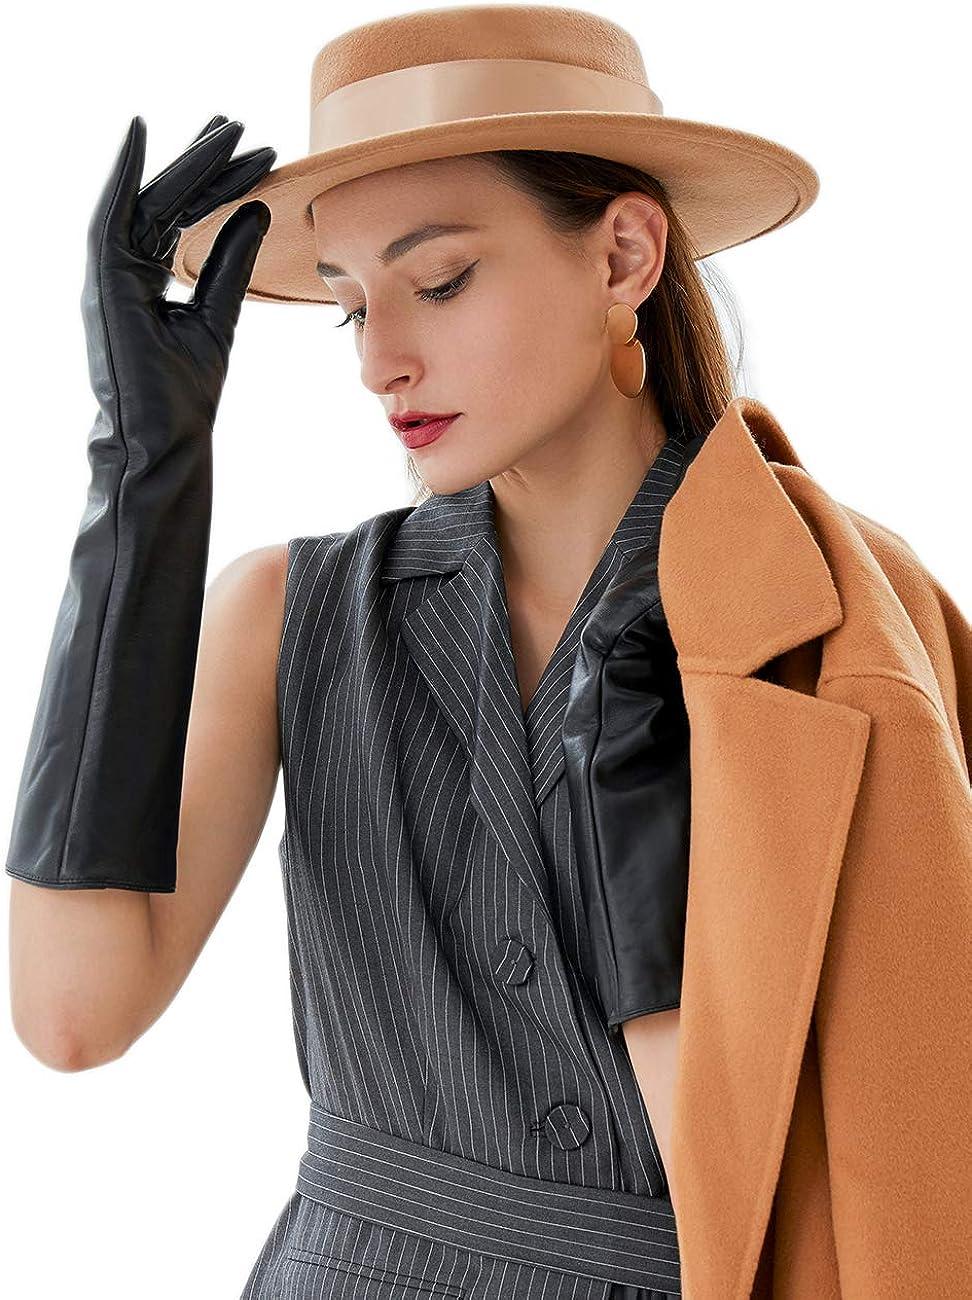 Vikideer Long Genuine Leather Gloves OFFicial shop Women Touchscreen for 2021 model Full